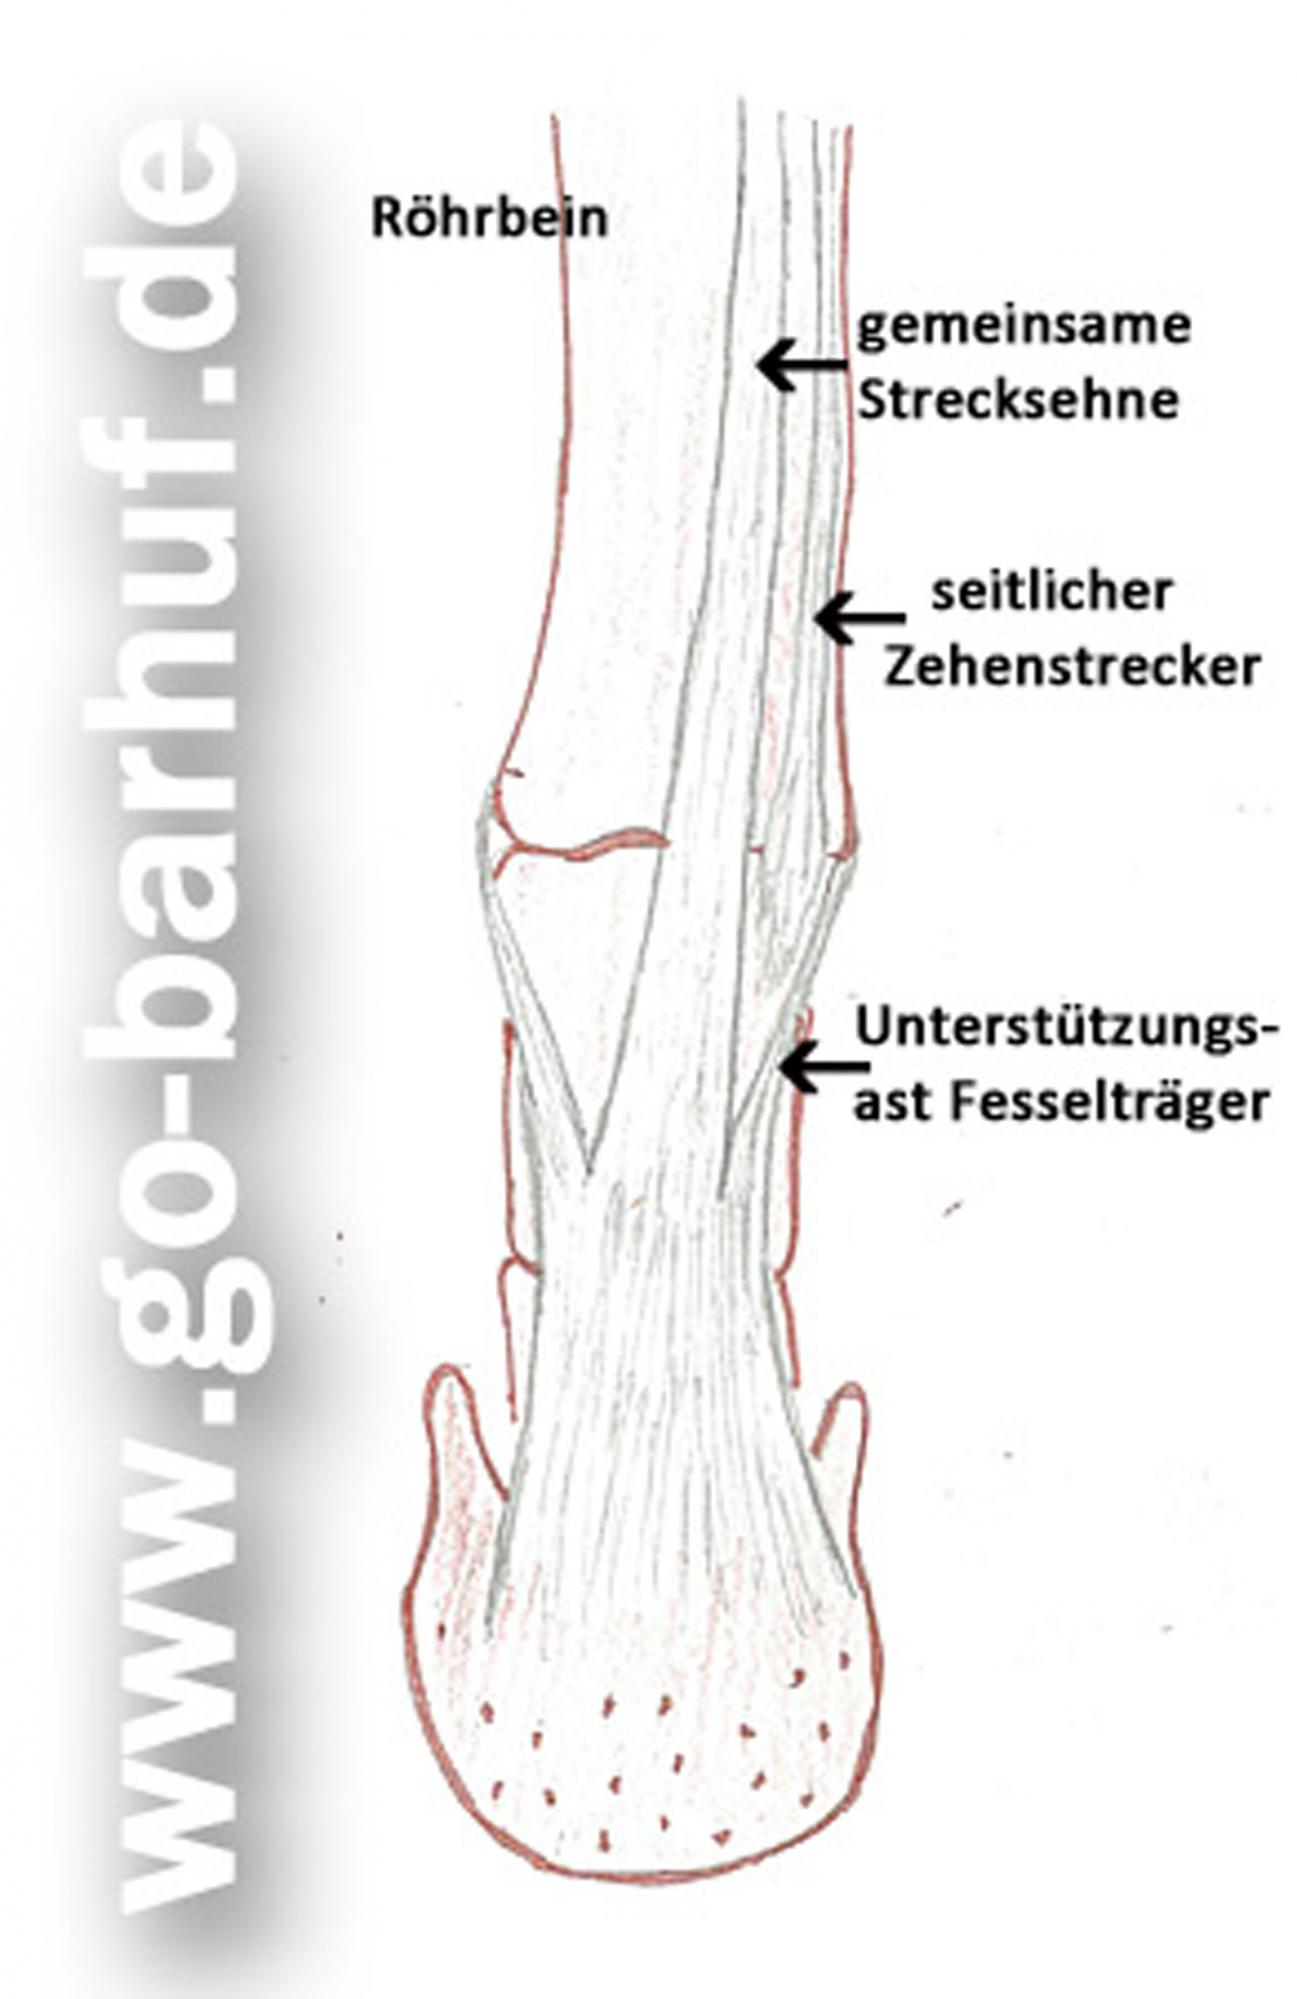 Manu Volk Go-barhuf.de - Sehnen